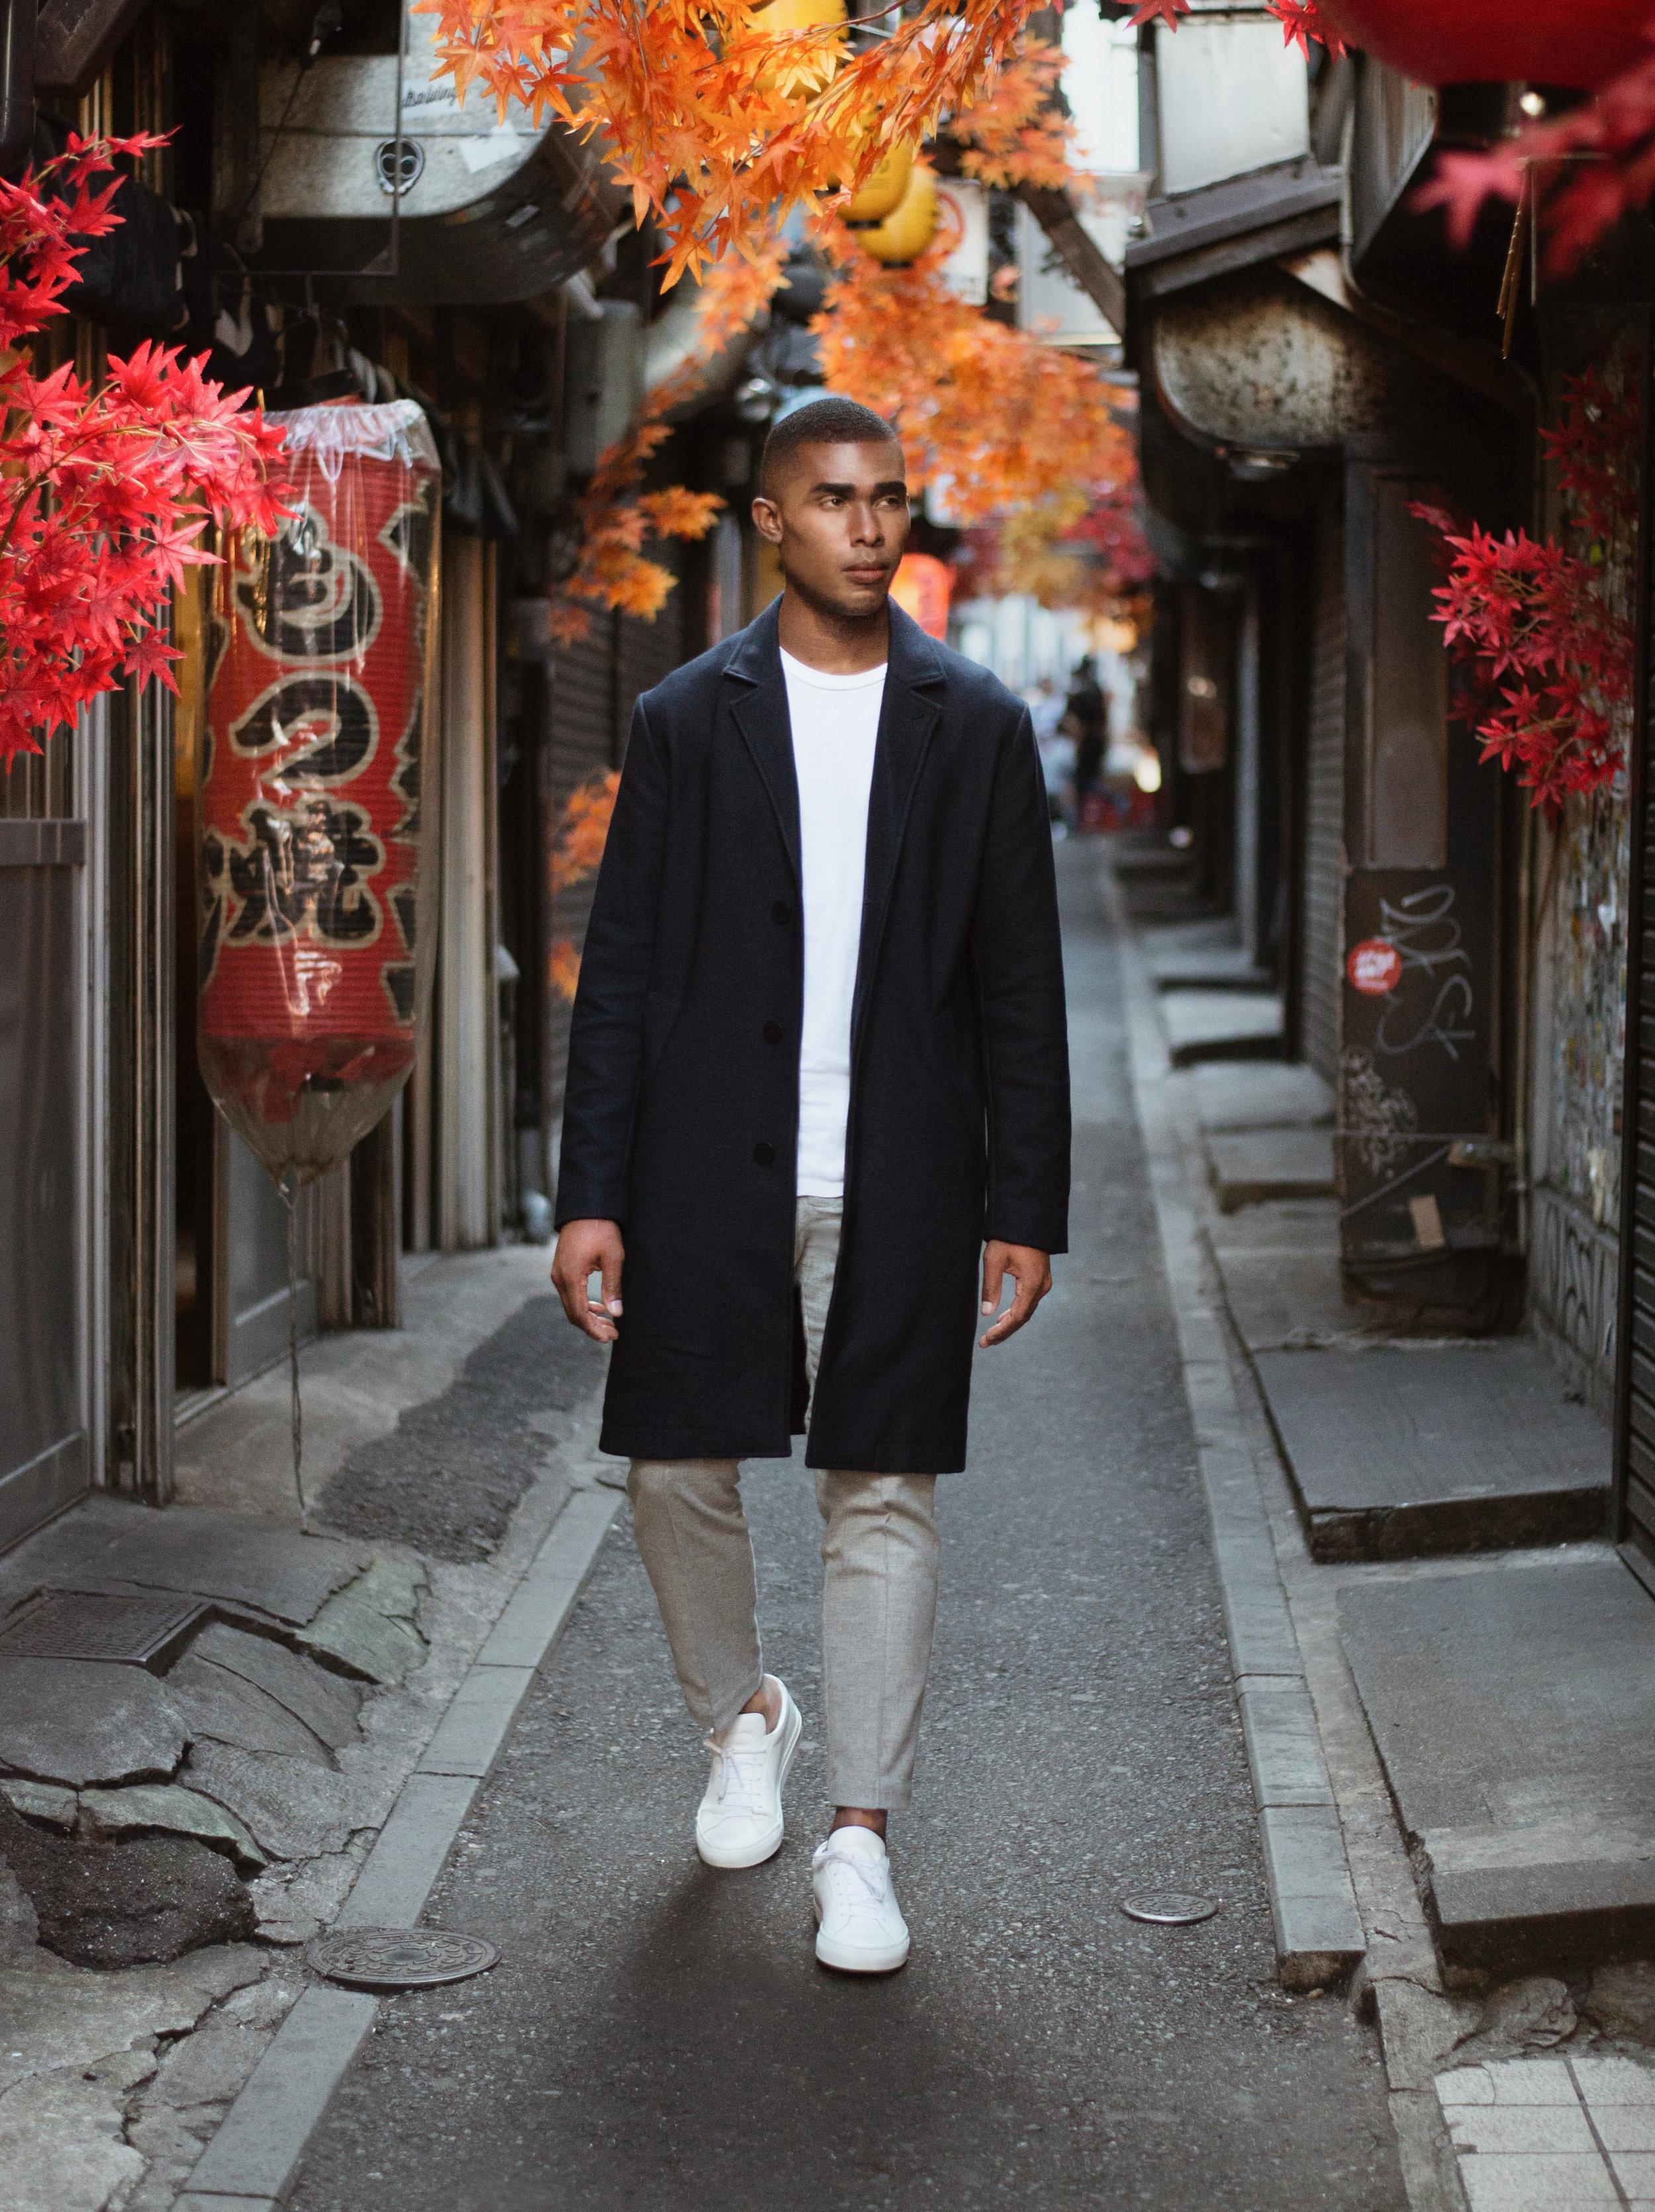 The-Look-Principle-Long-Fall-Overcat-Shinjuku-Golden-Gai-1.JPG